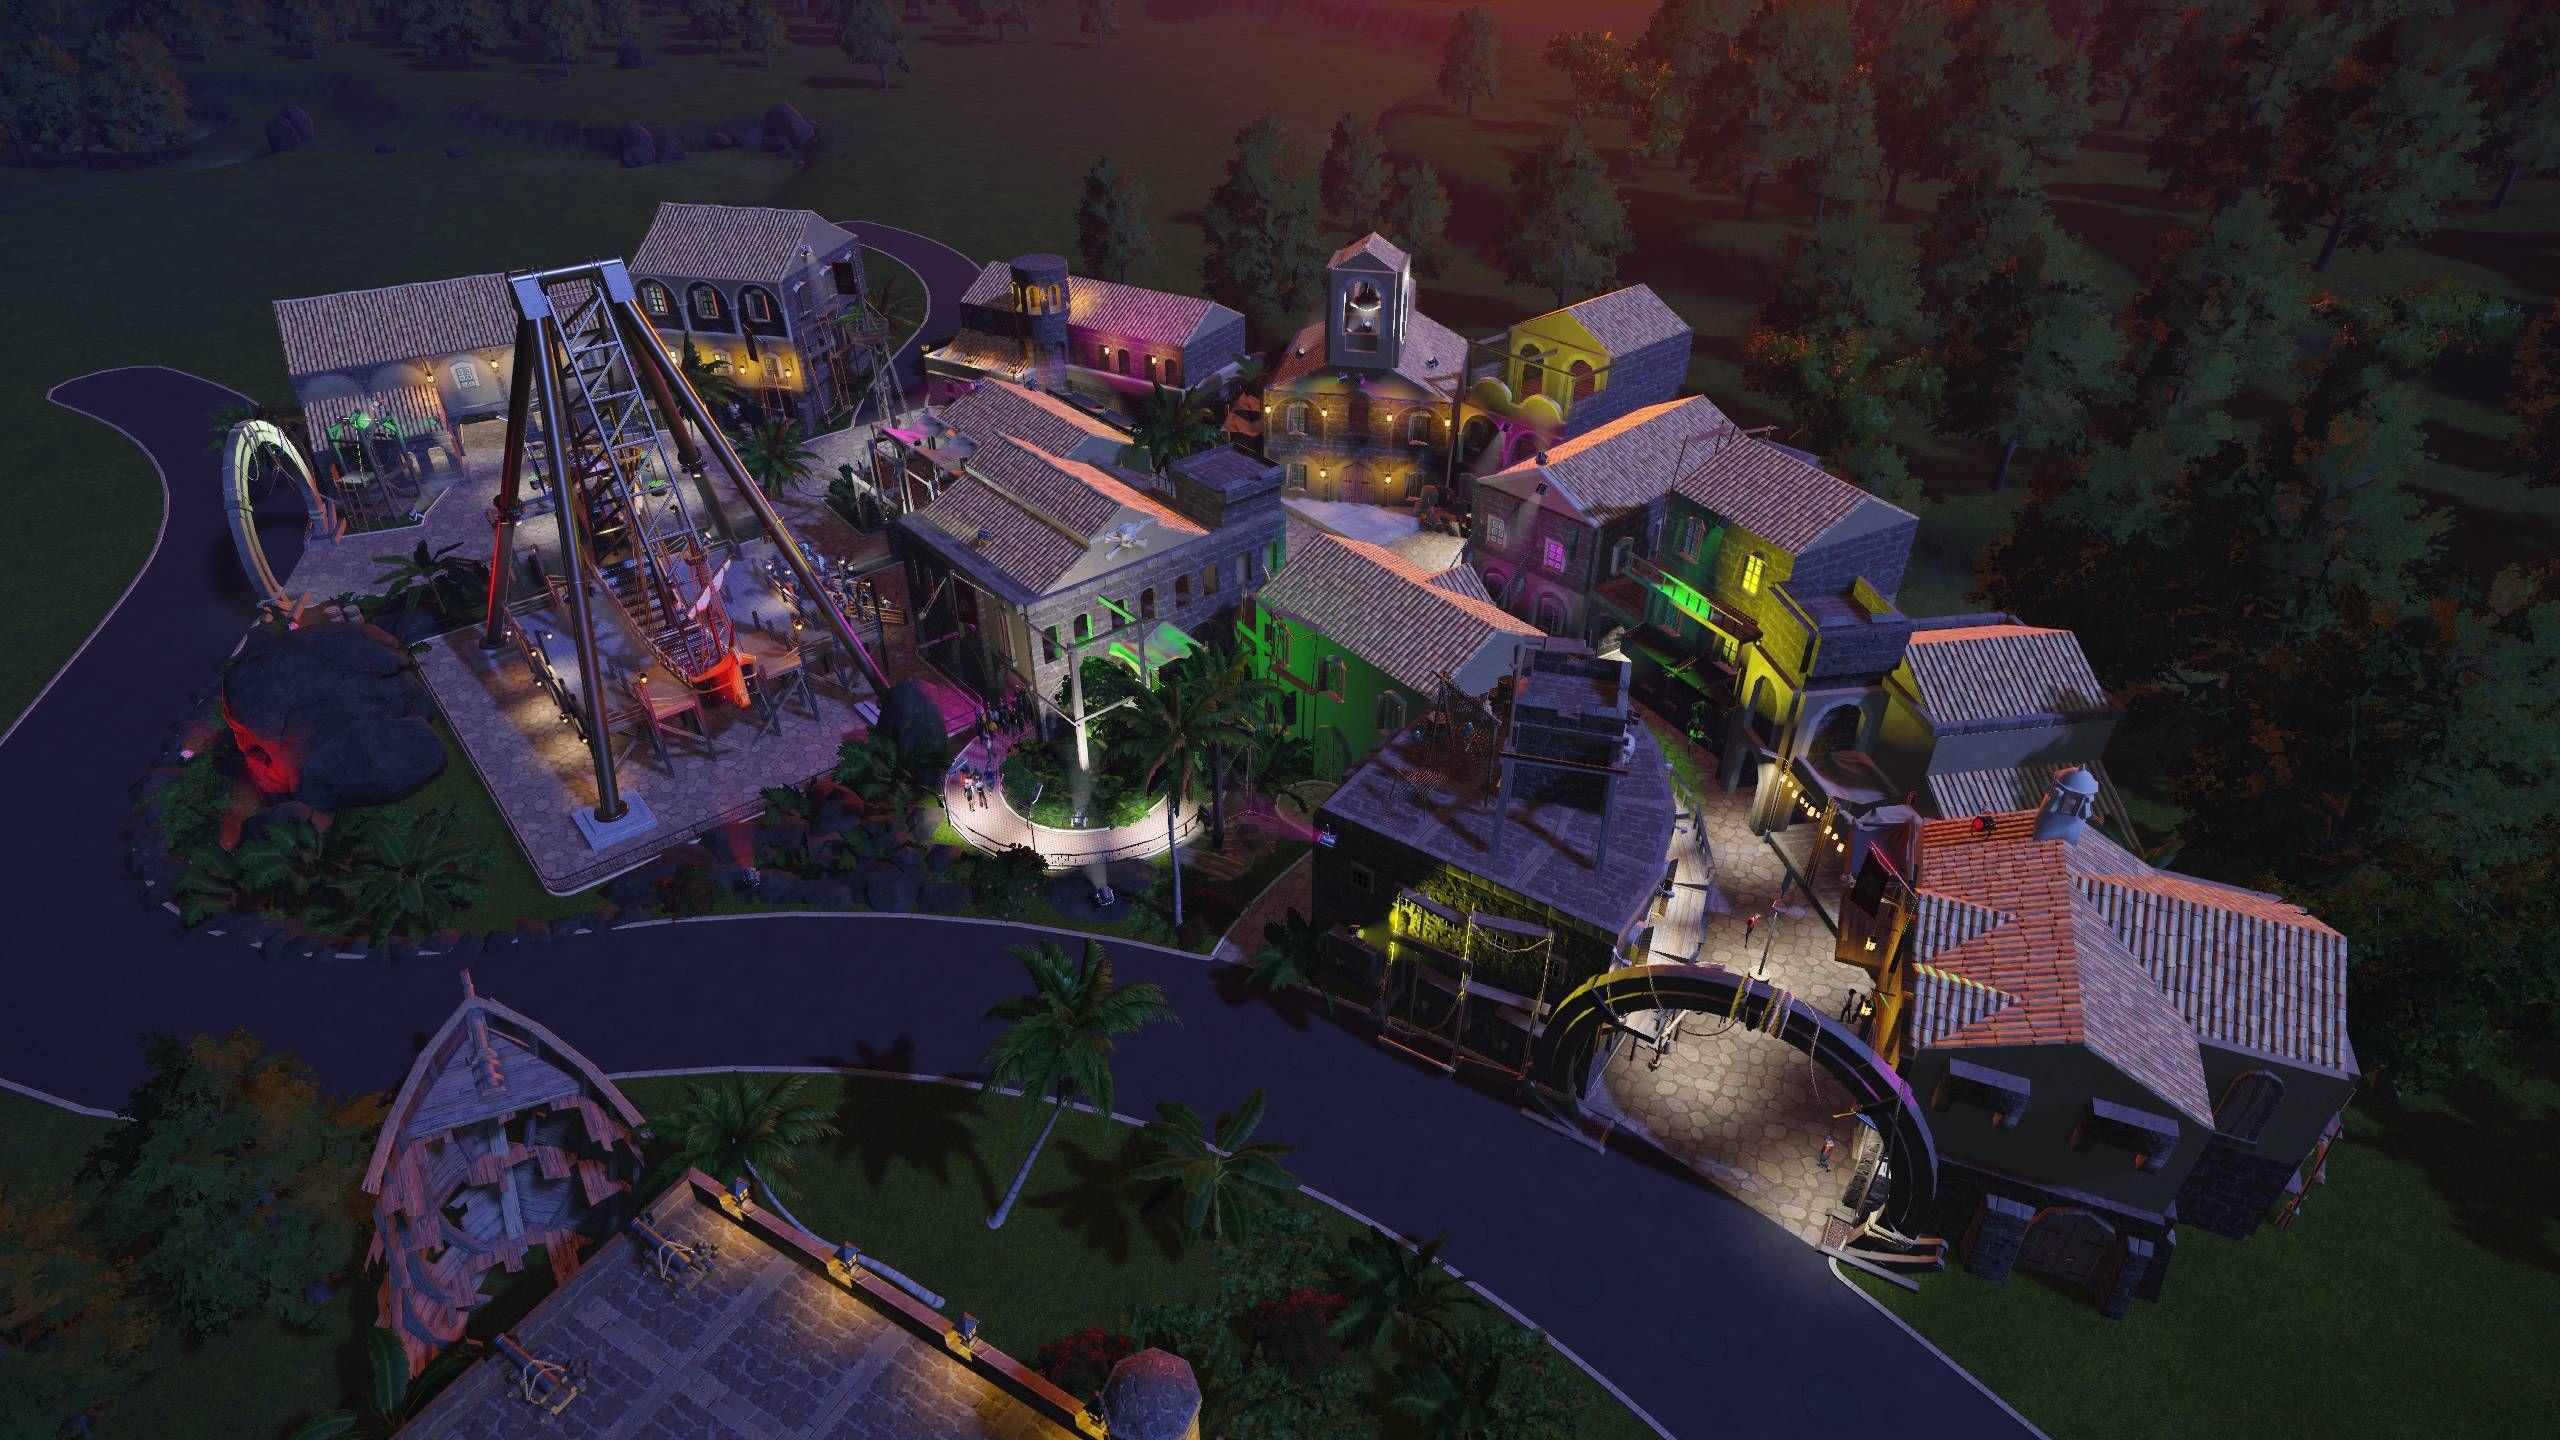 Piragon Alley - Pirate Theme Street   Planet Coaster